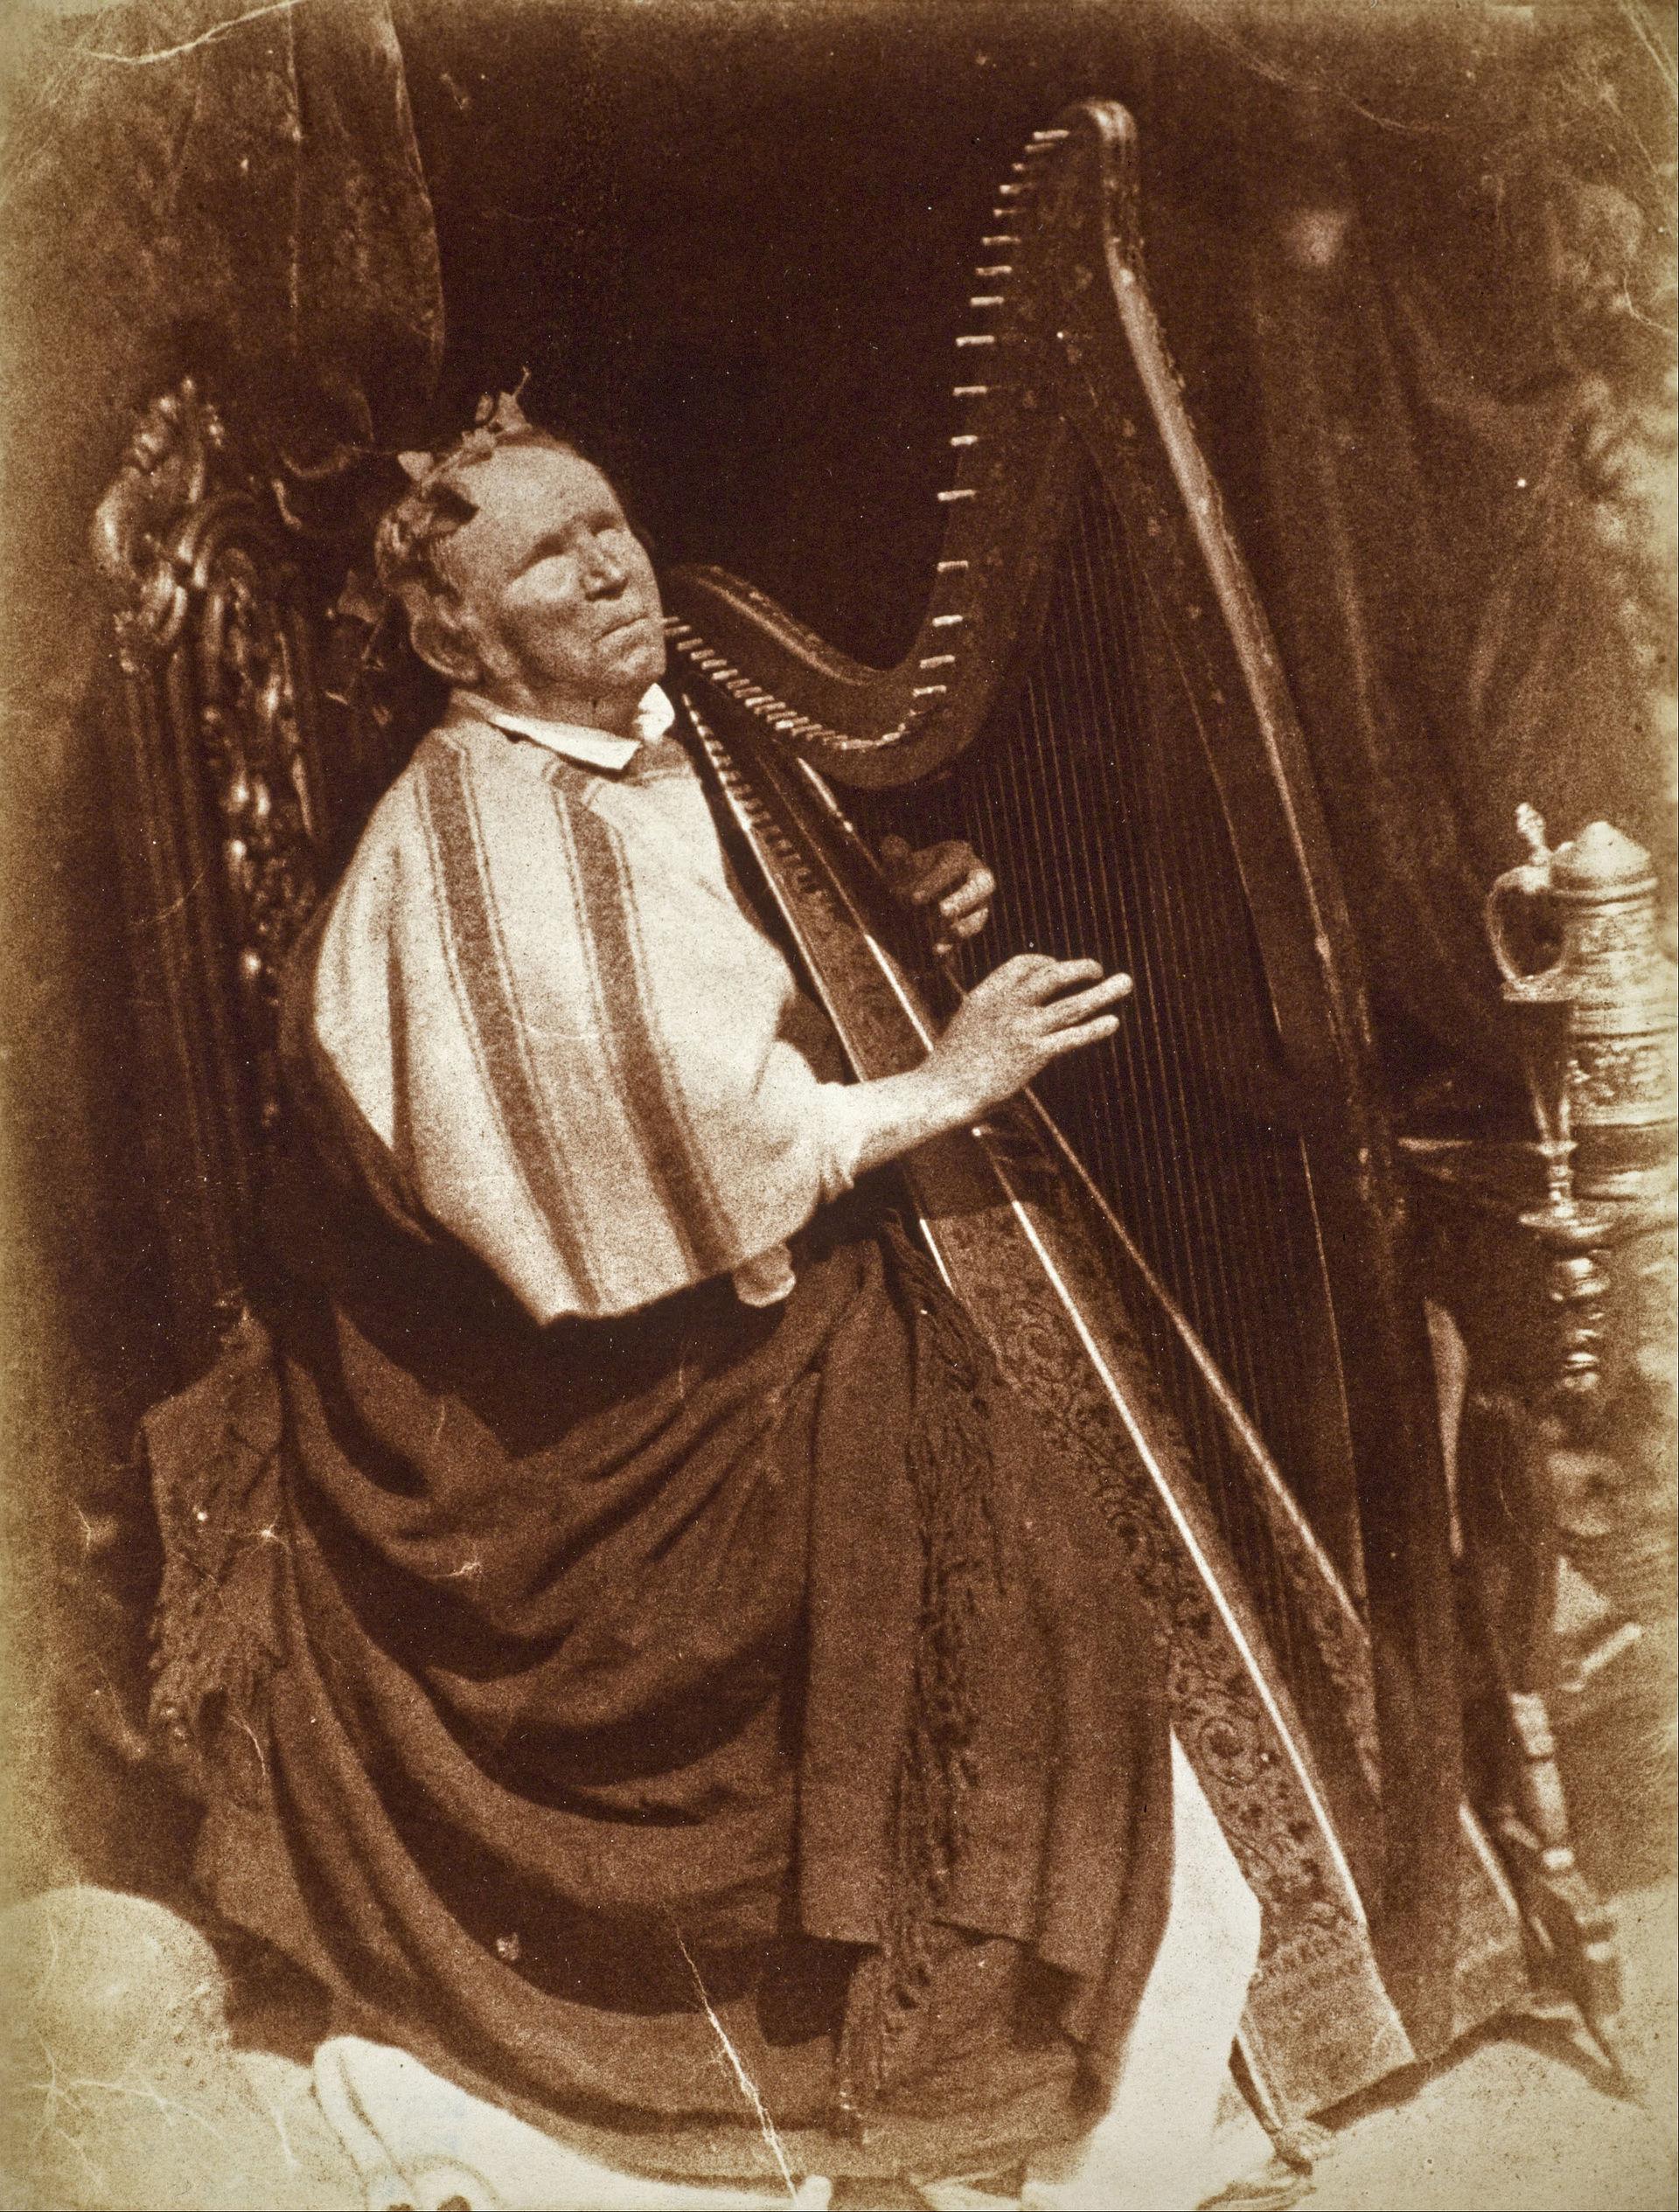 belfast harp festival essay The belfast harp festival  of the 1792 harper's festival, at which edward bunting started to write down some of the last remaining old irish harp music .